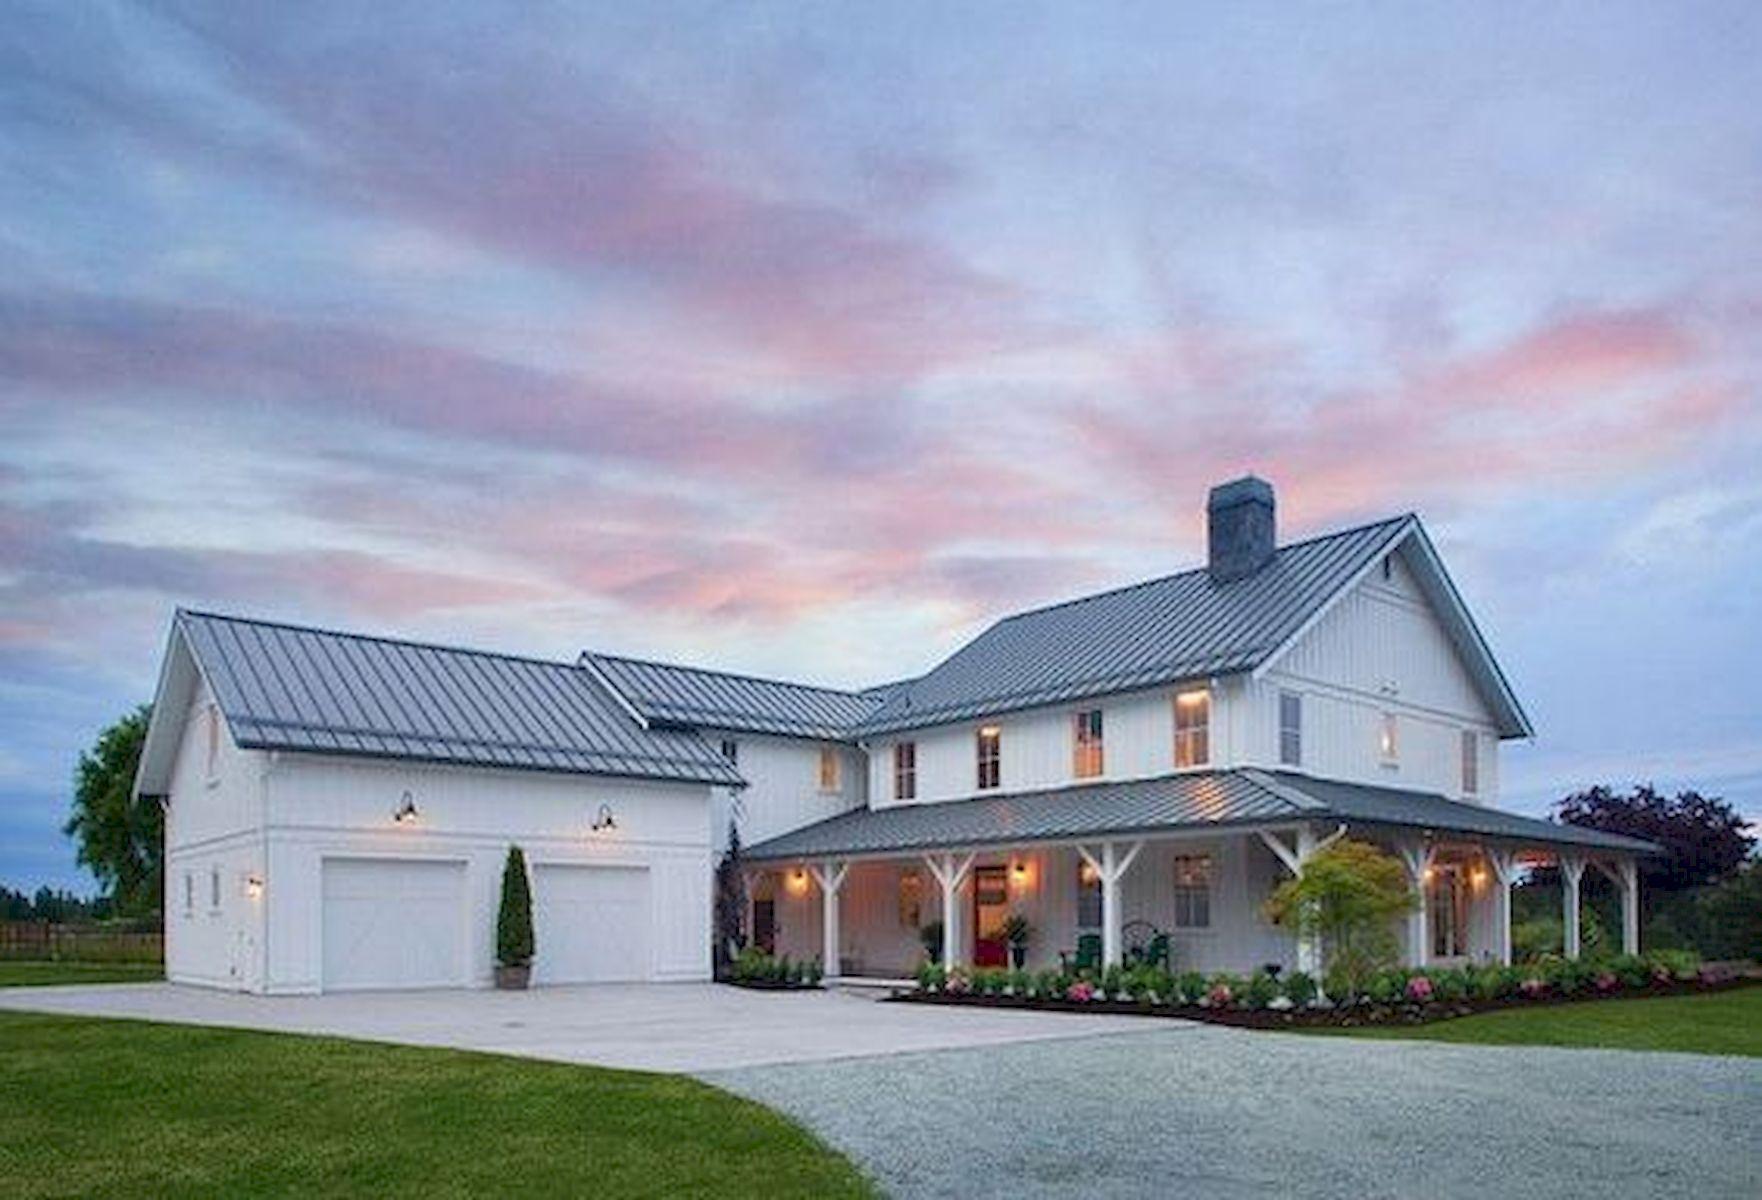 60 most popular modern dream house exterior design ideas on most popular modern dream house exterior design ideas the best destination id=21897